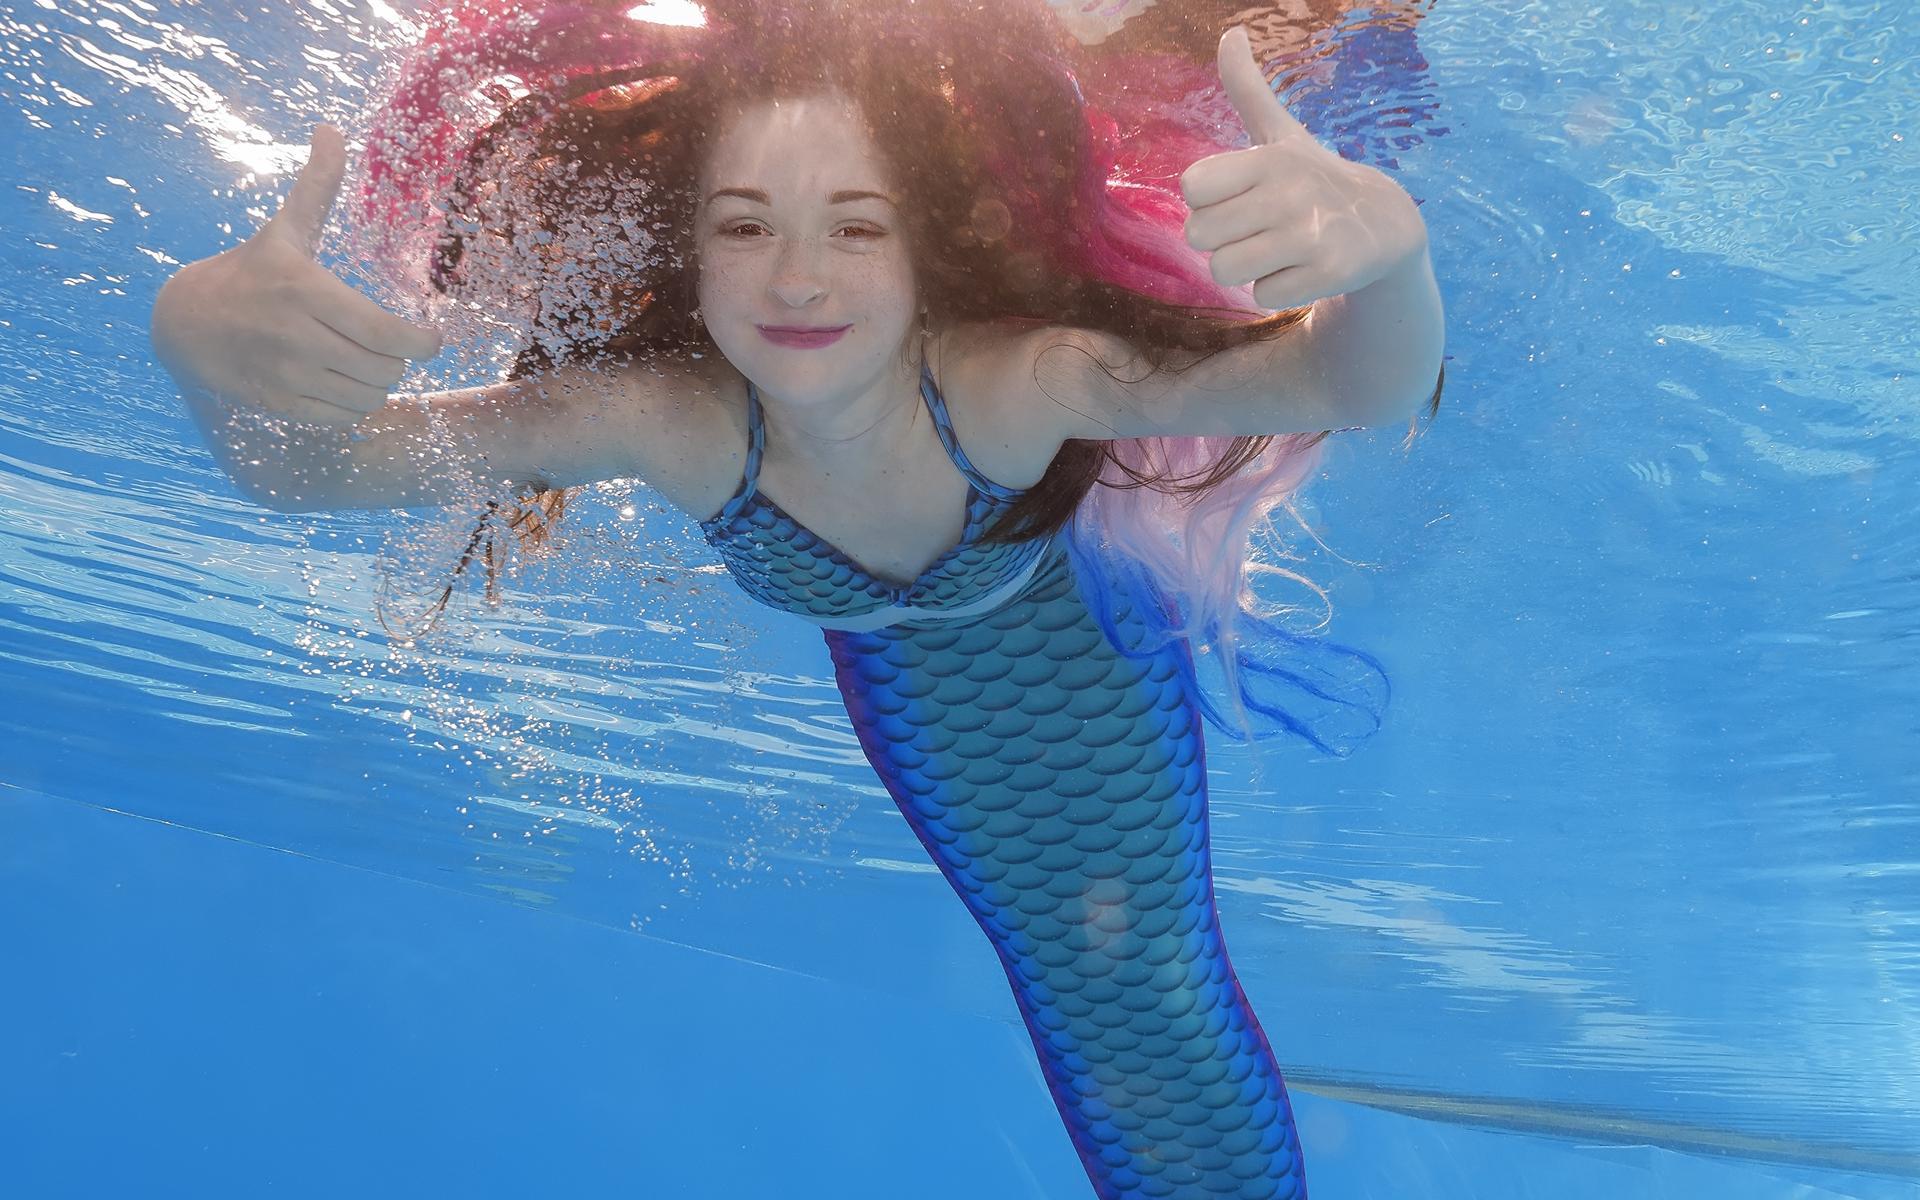 Mermaiding Meerjungfrauenschwimmen